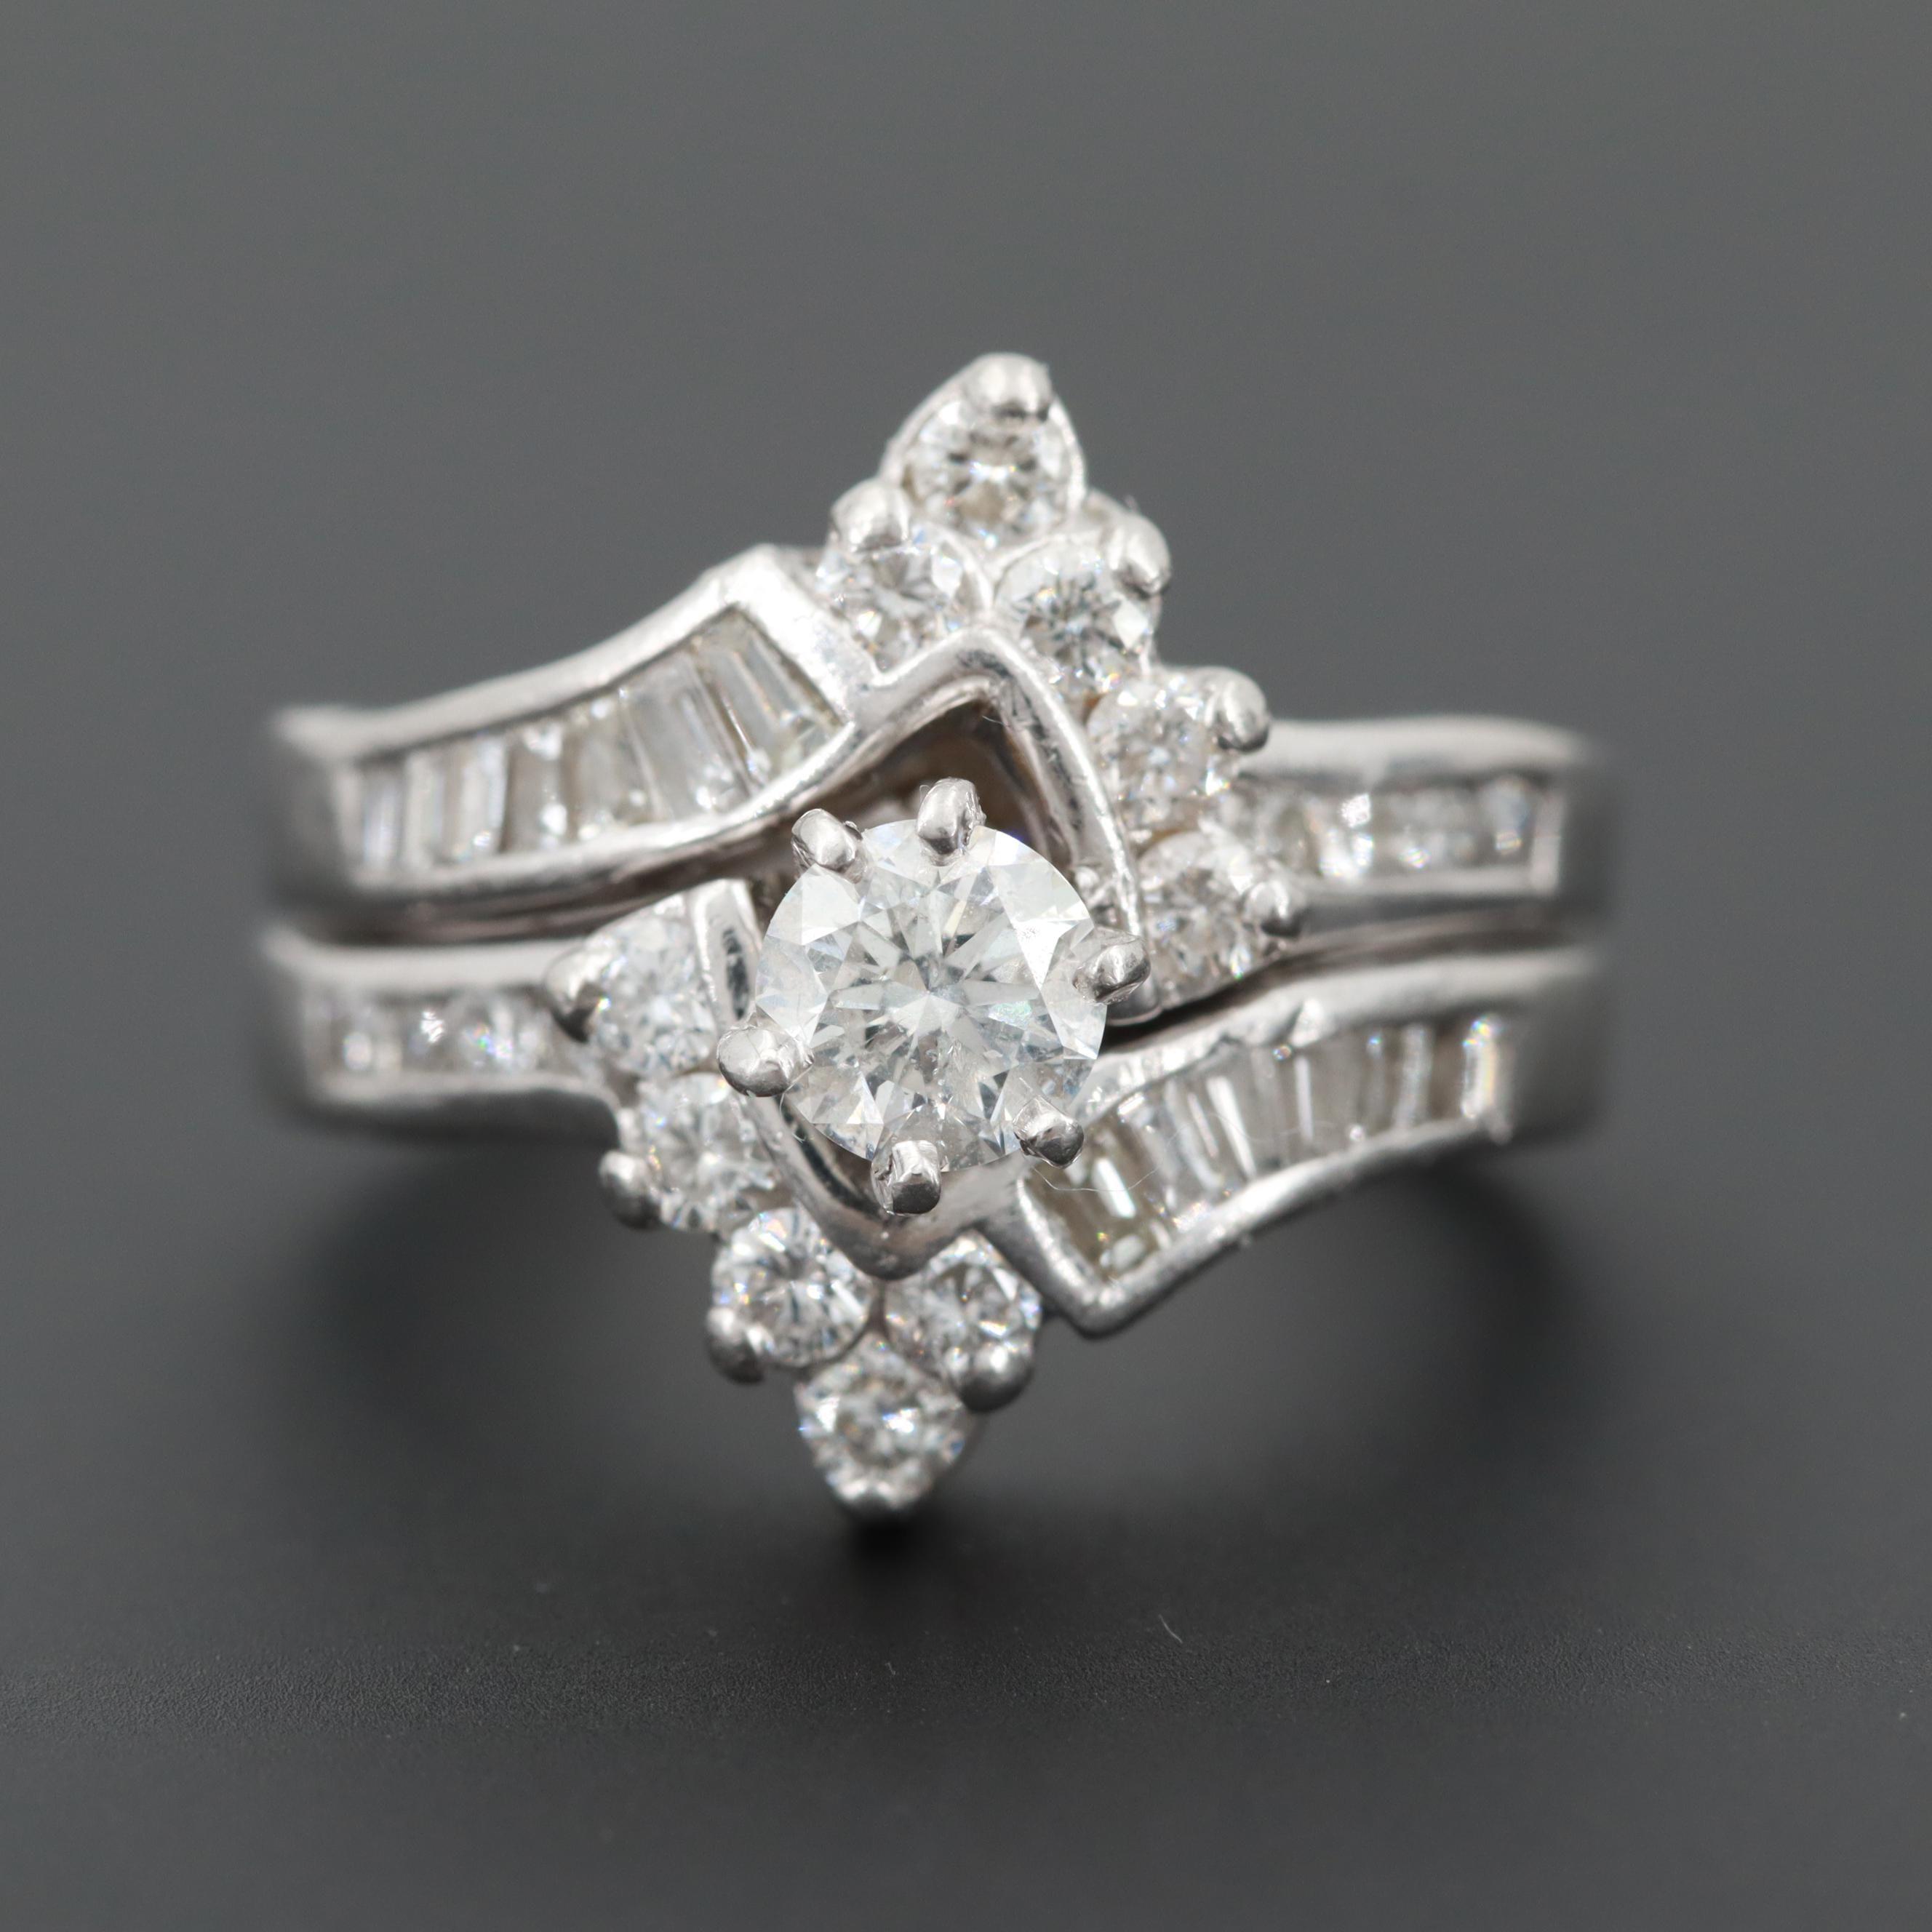 Platinum 1.25 CTW Diamond Ring with Ring Enhancer